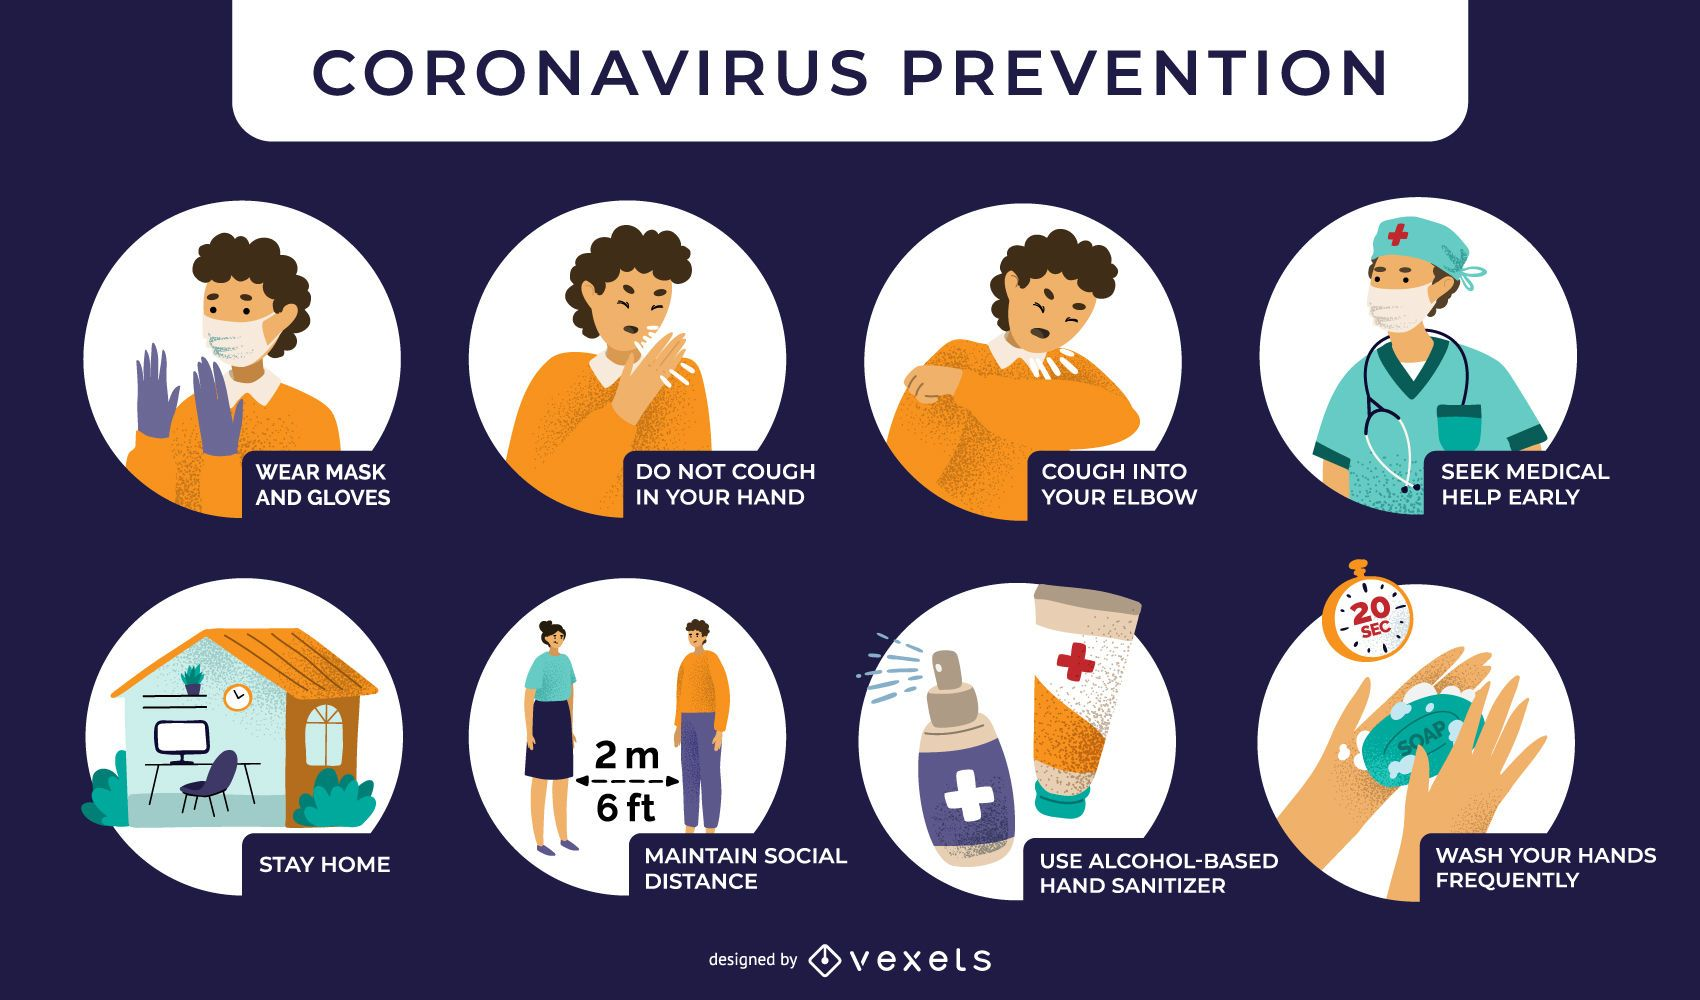 Coronavirus prevention illustrations